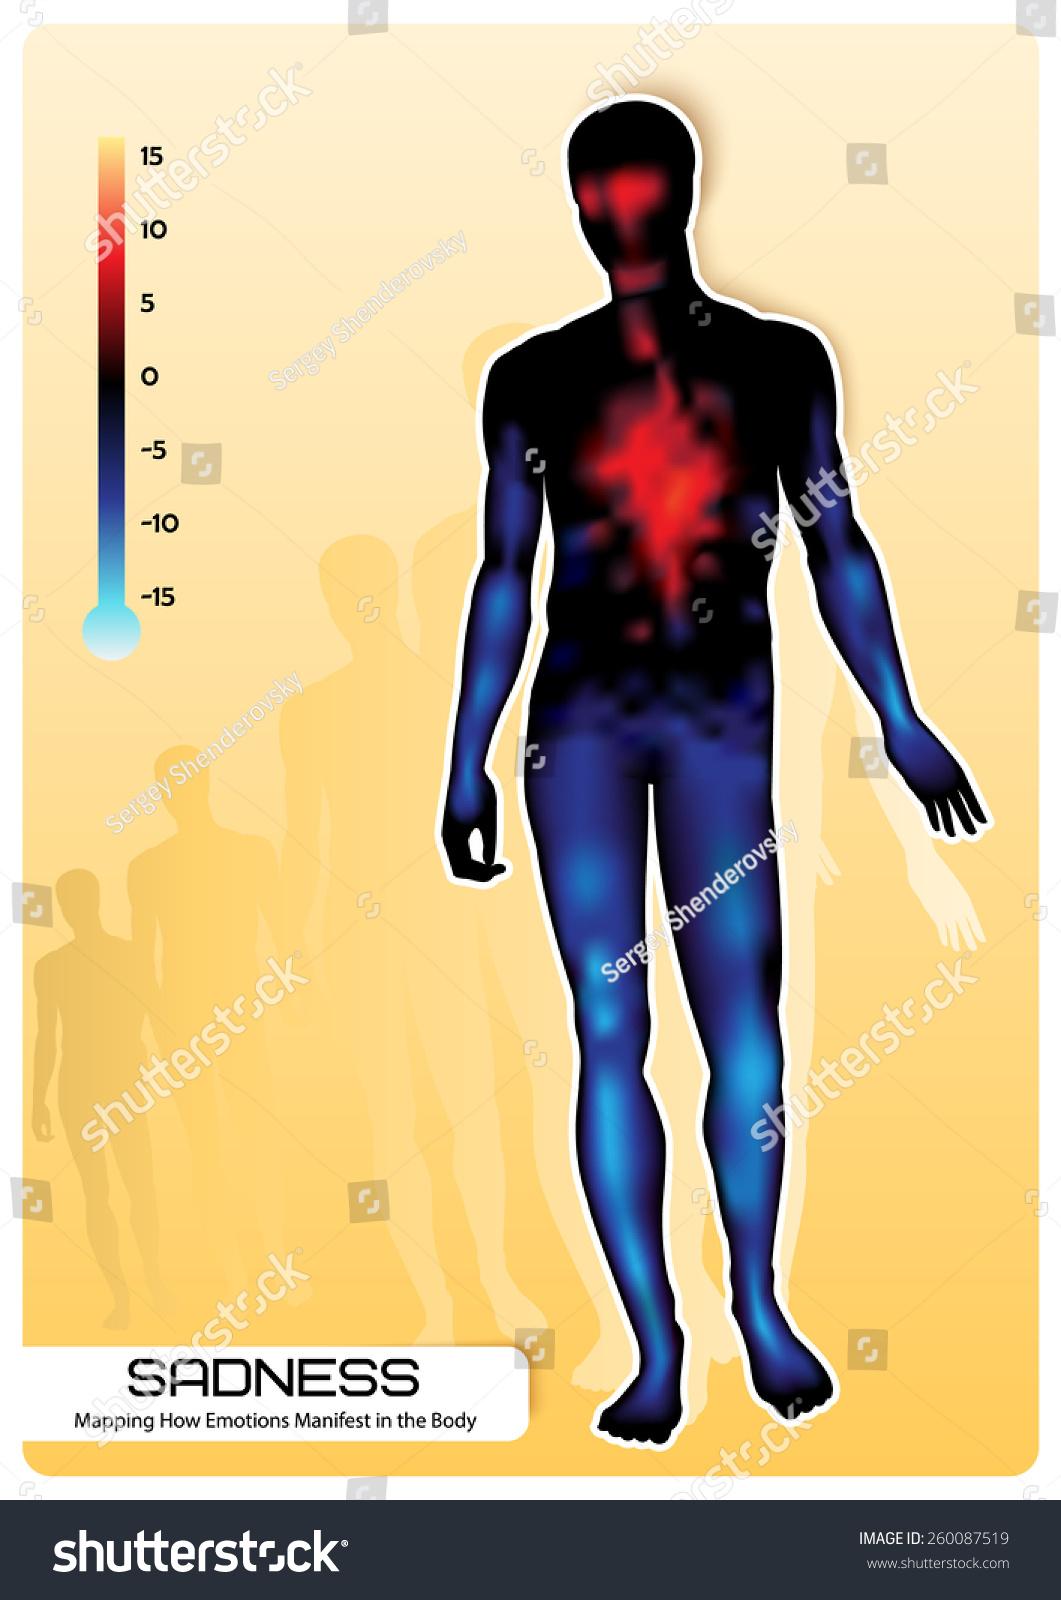 profile human figure visual representation emotions stock vector (royalty  free) 260087519  shutterstock